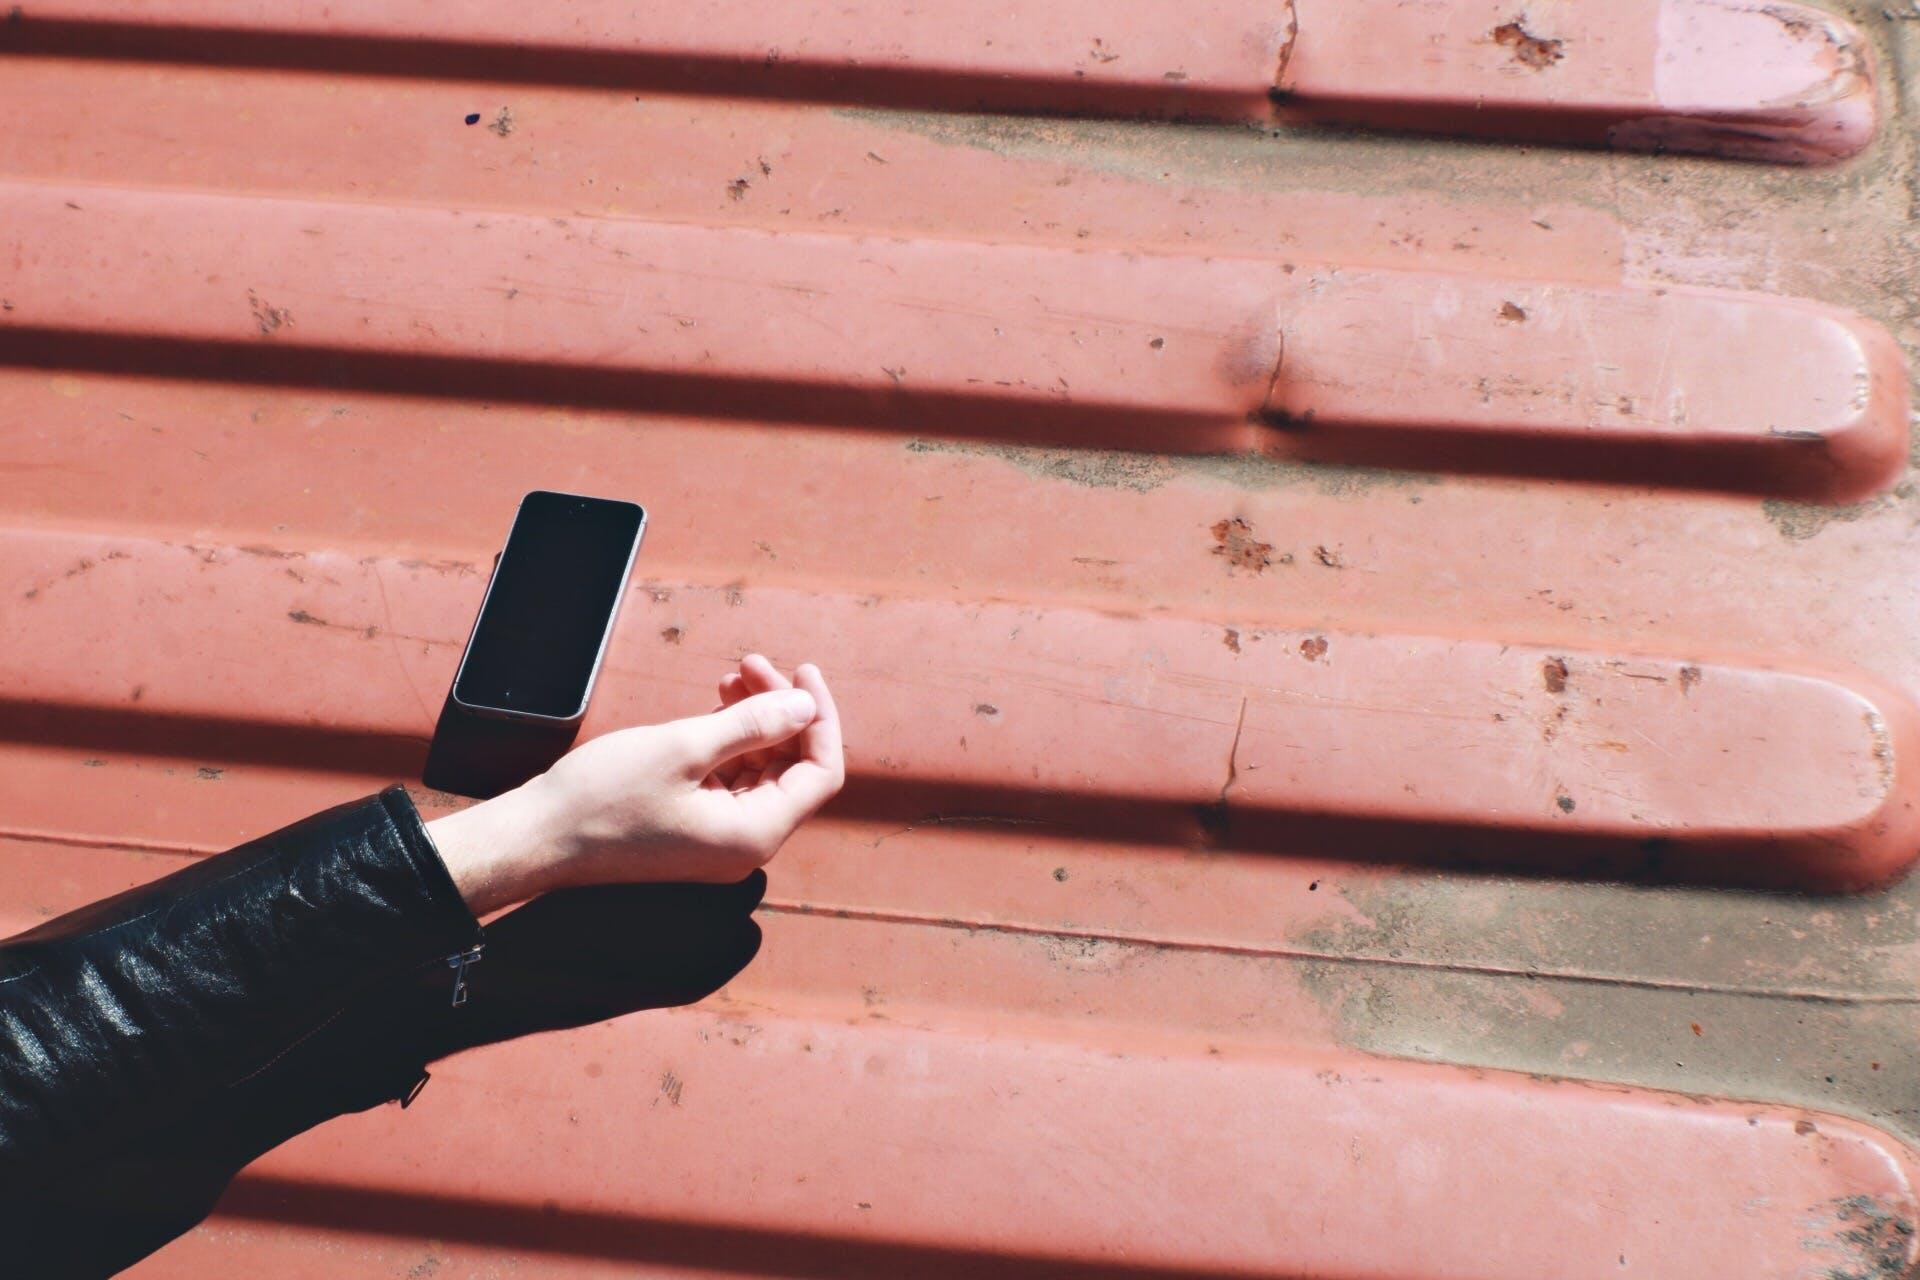 Black Smartphone Near Human Hand